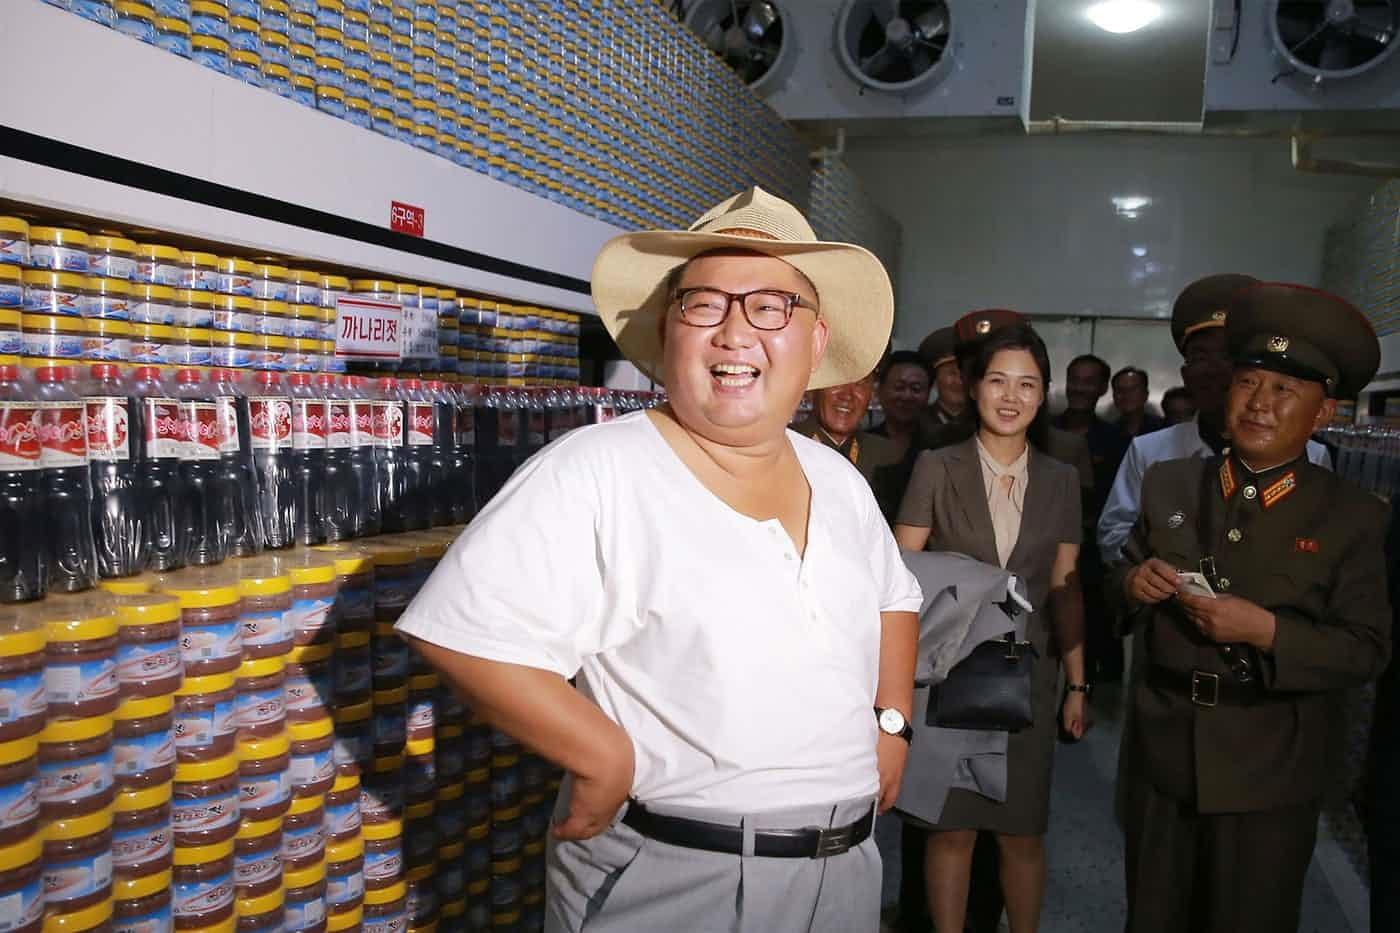 تصویری,عکس,عکس روز خبری,کره شمالی